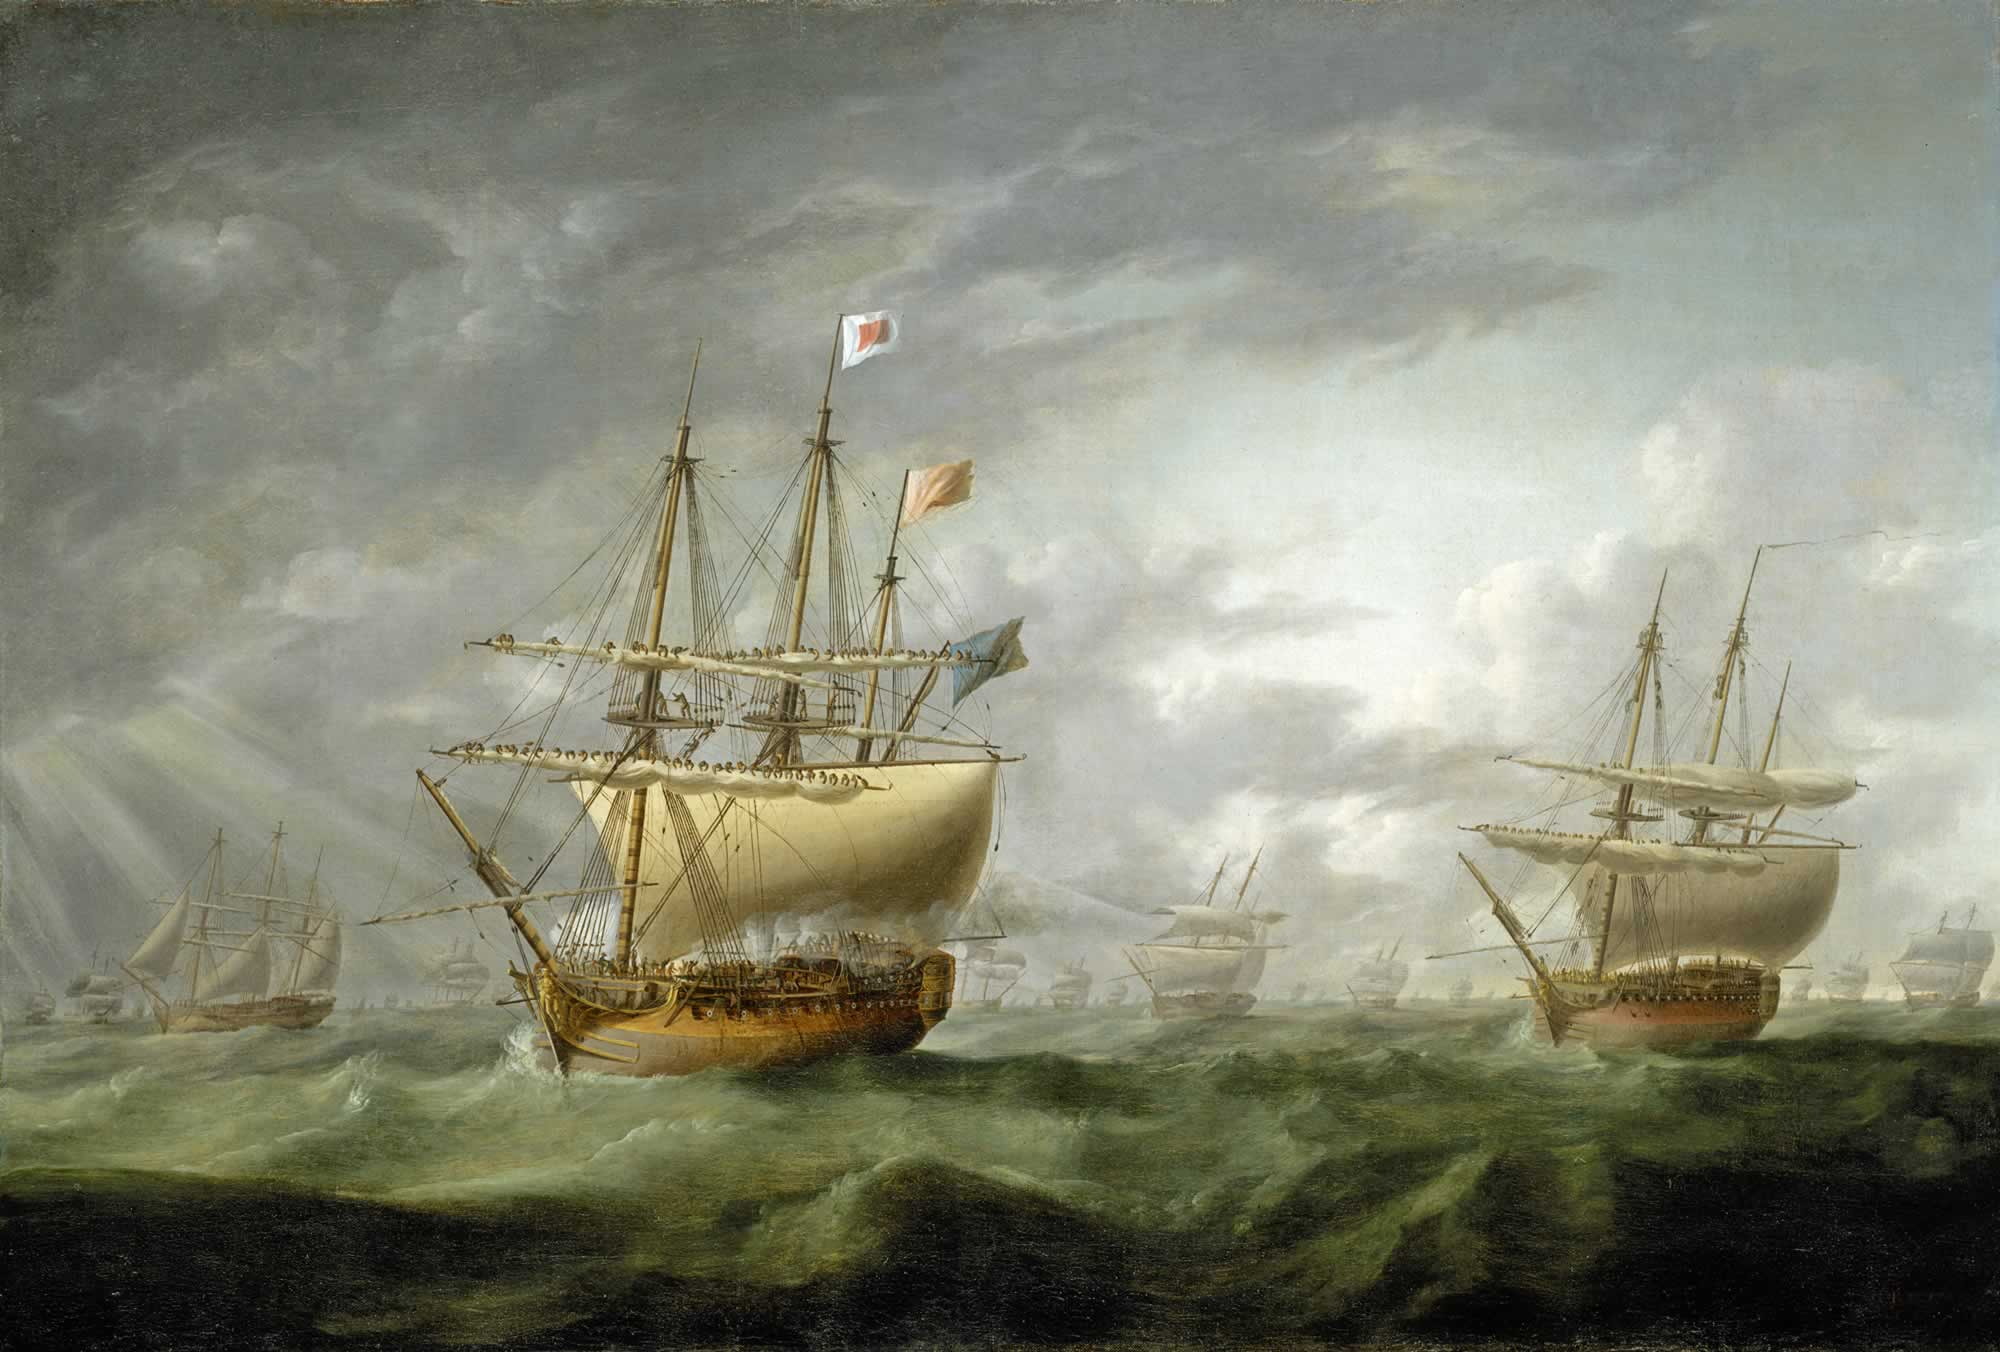 Файл:HMS Ramillies in 1782.jpg